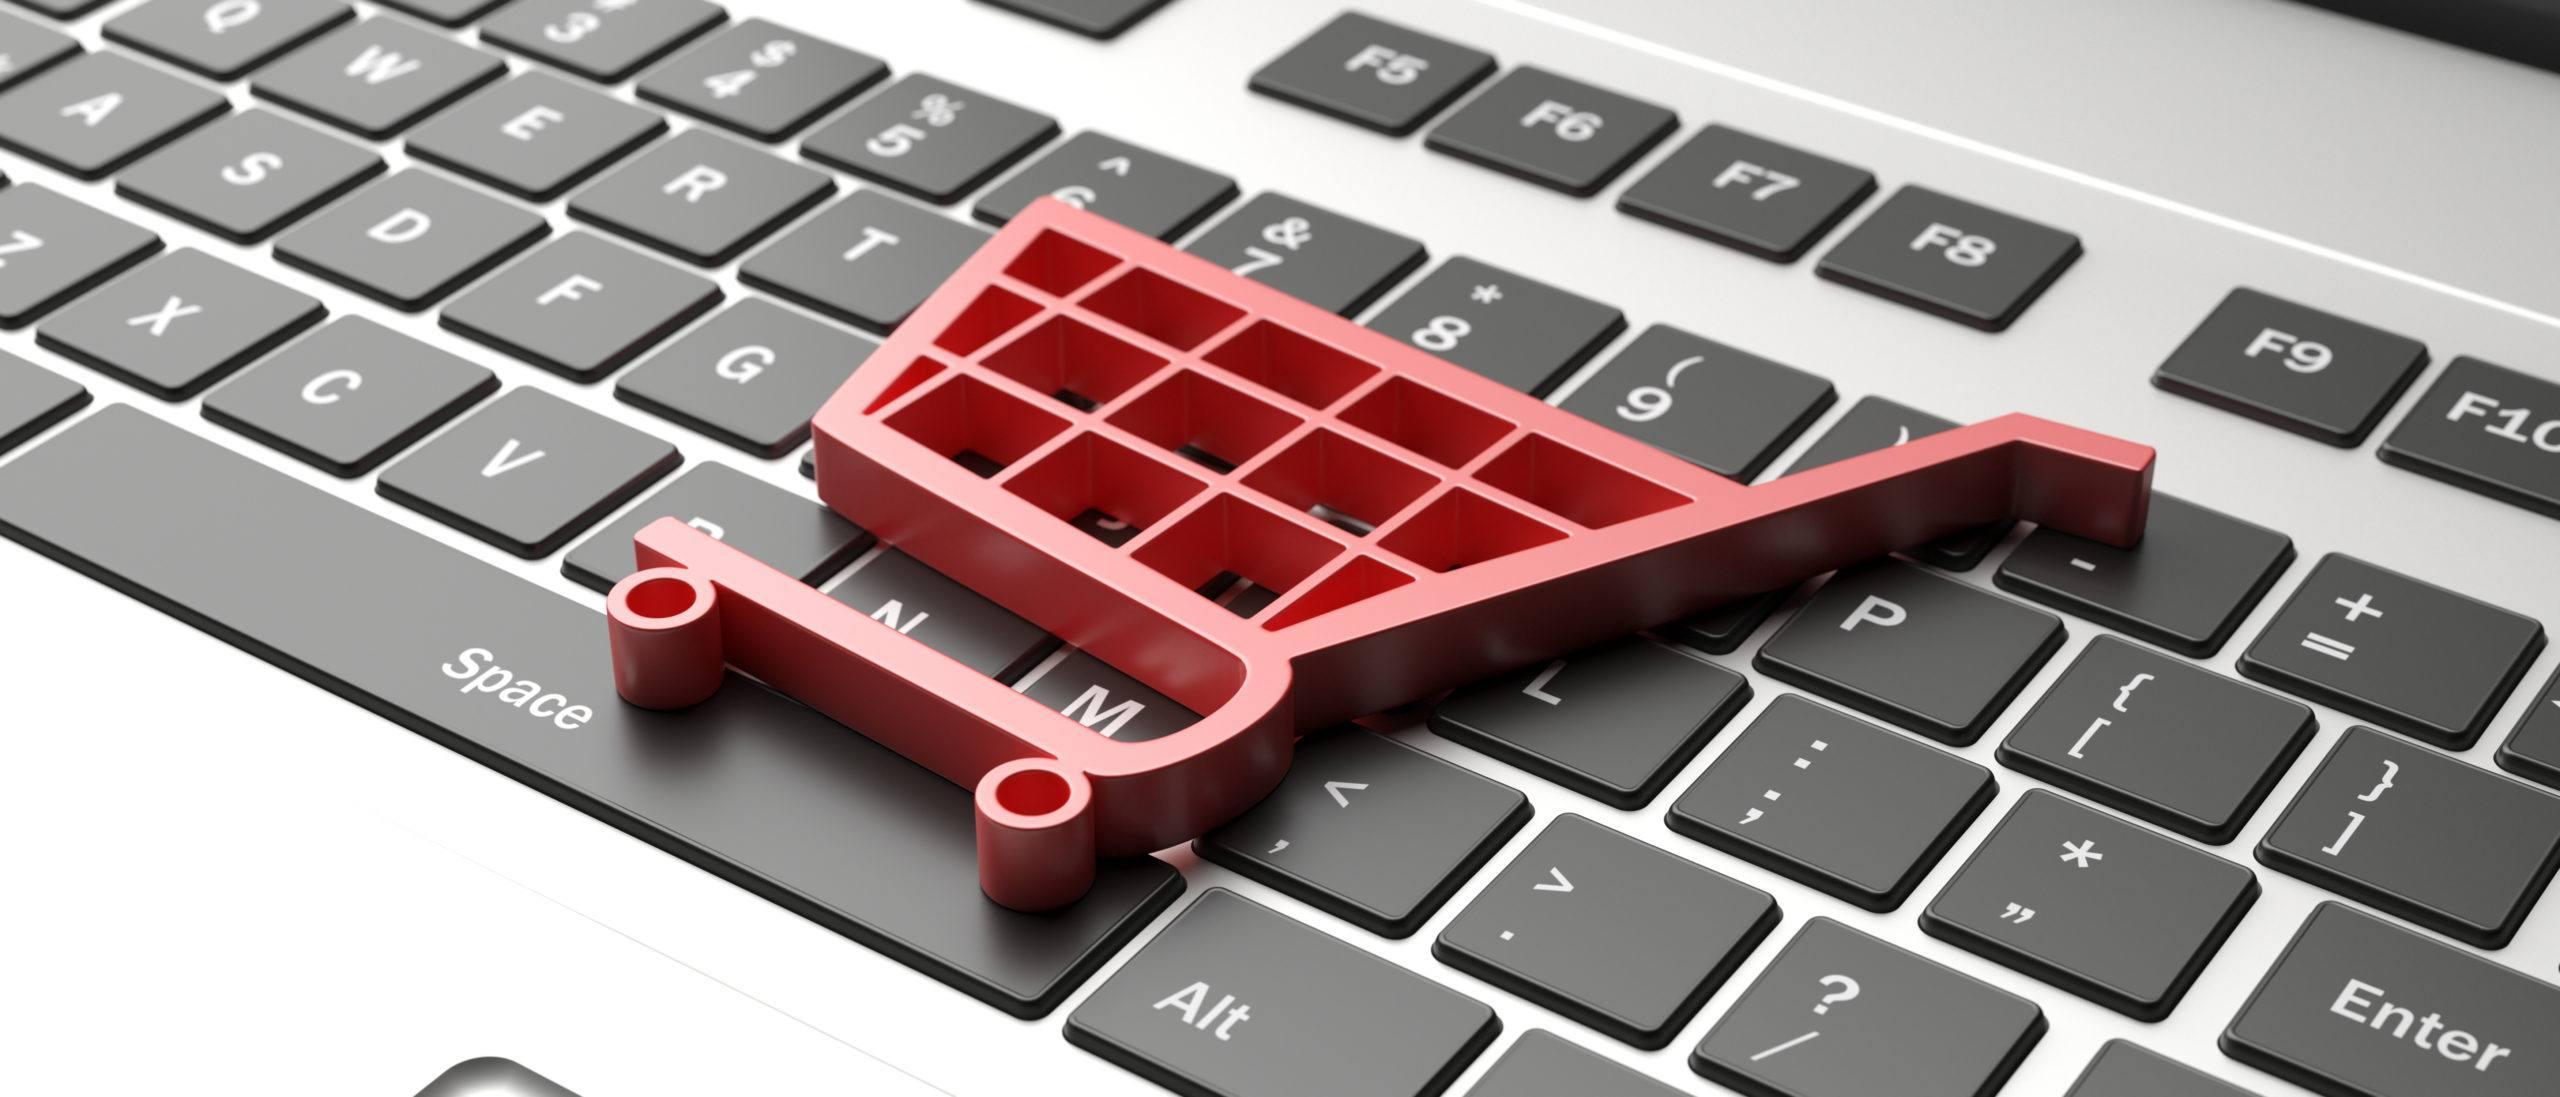 brand | e commerce symbol on a computer keyboard black fri PV7TGNB scaled